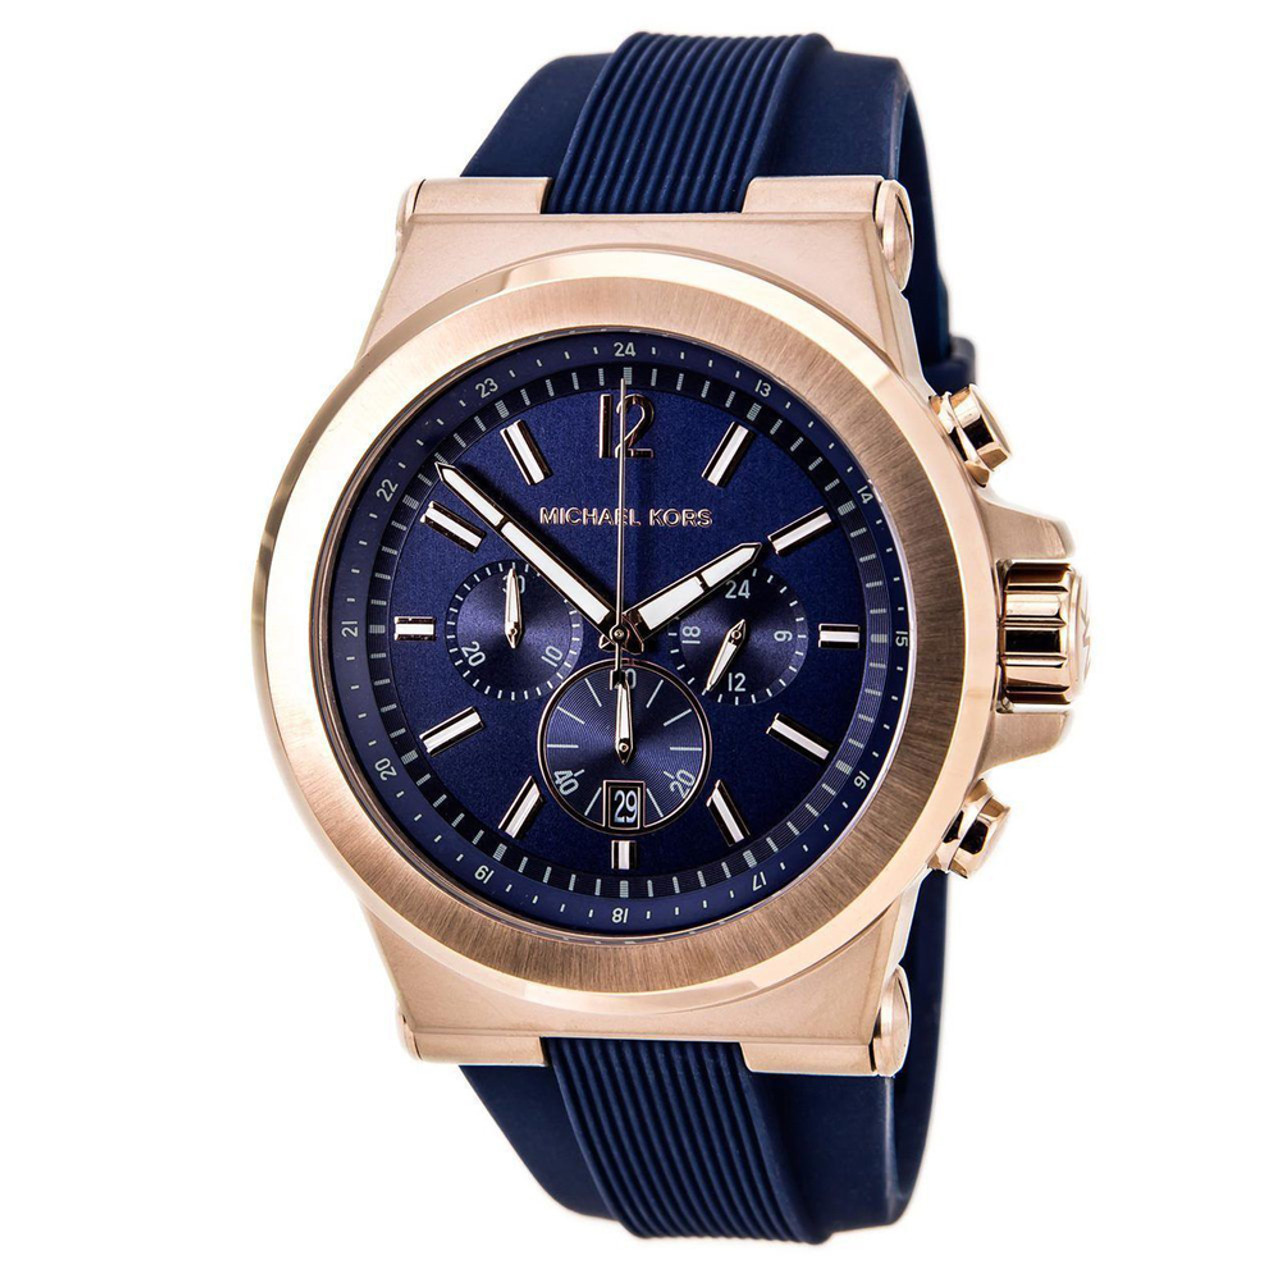 41c33ea7e921 Michael Kors MK8295 Dylan Rose-tone Chronograph Blue Silicone Mens Watch -  The Royal Gift Inc.